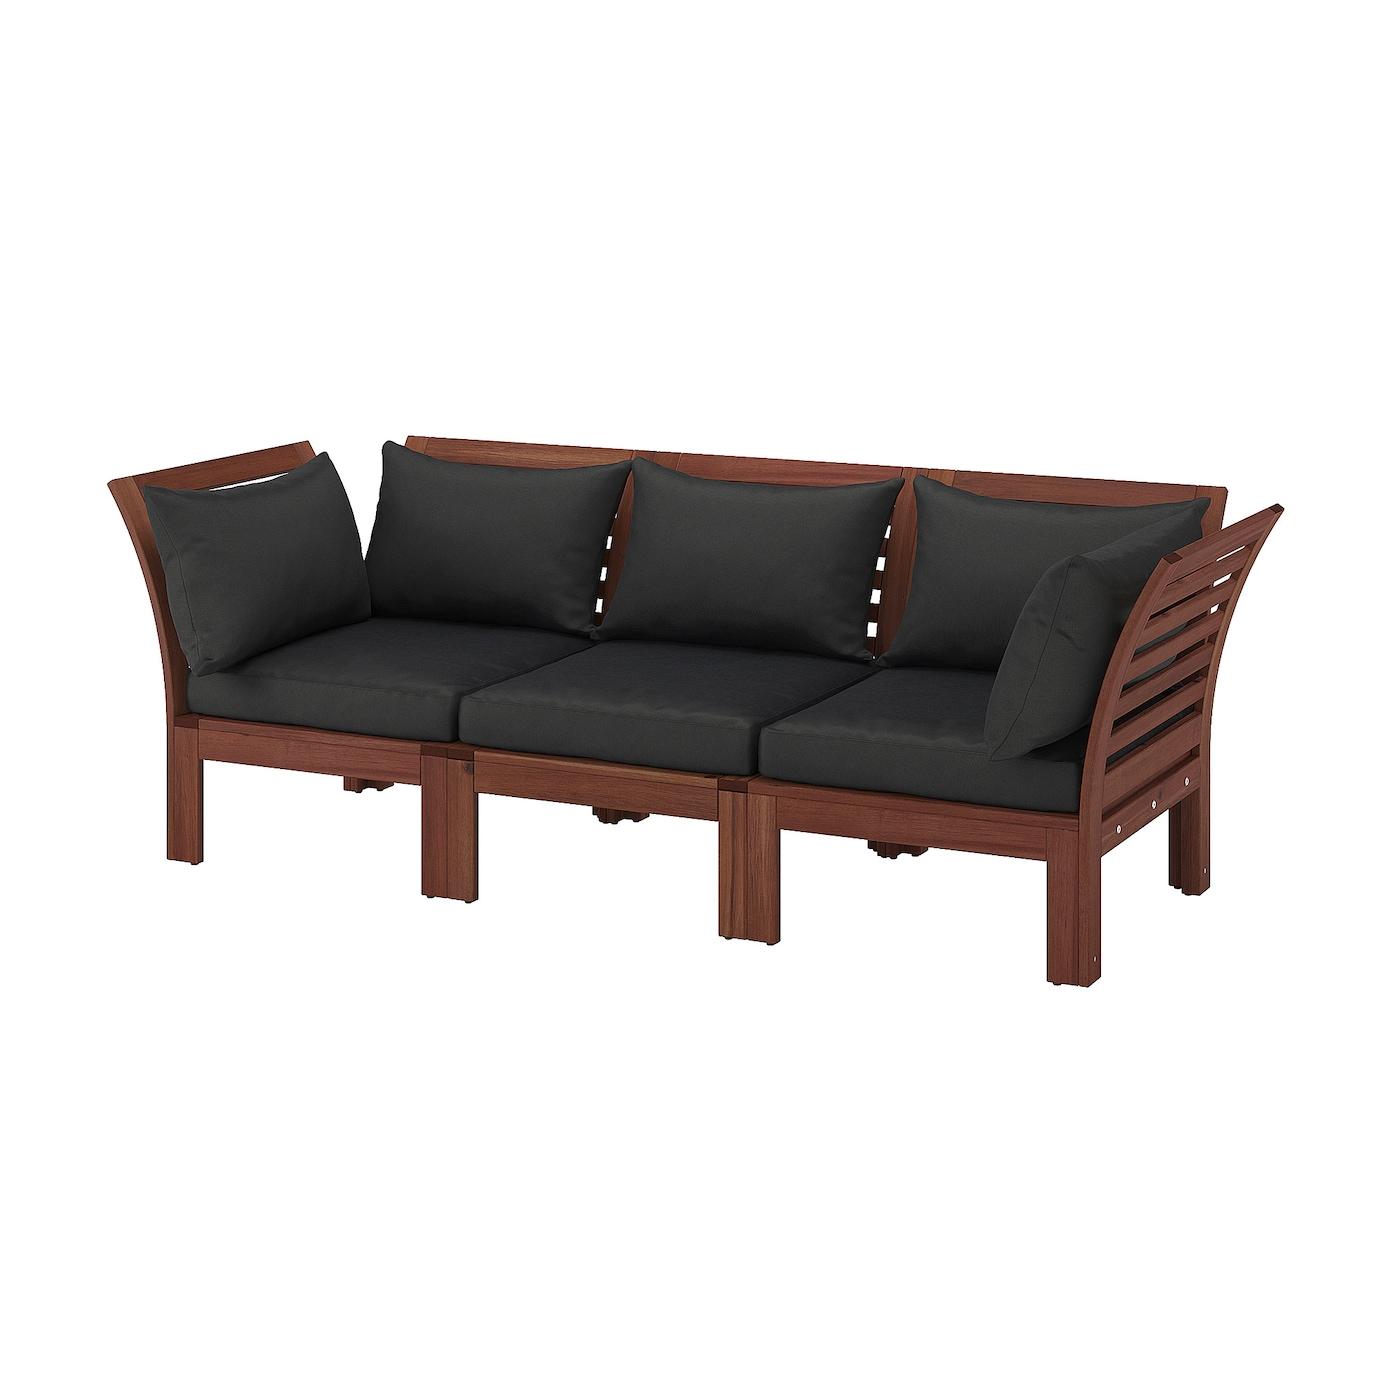 ÄPPLARÖ 3-seat modular sofa, outdoor, brown stained, Frösön/Duvholmen dark  grey